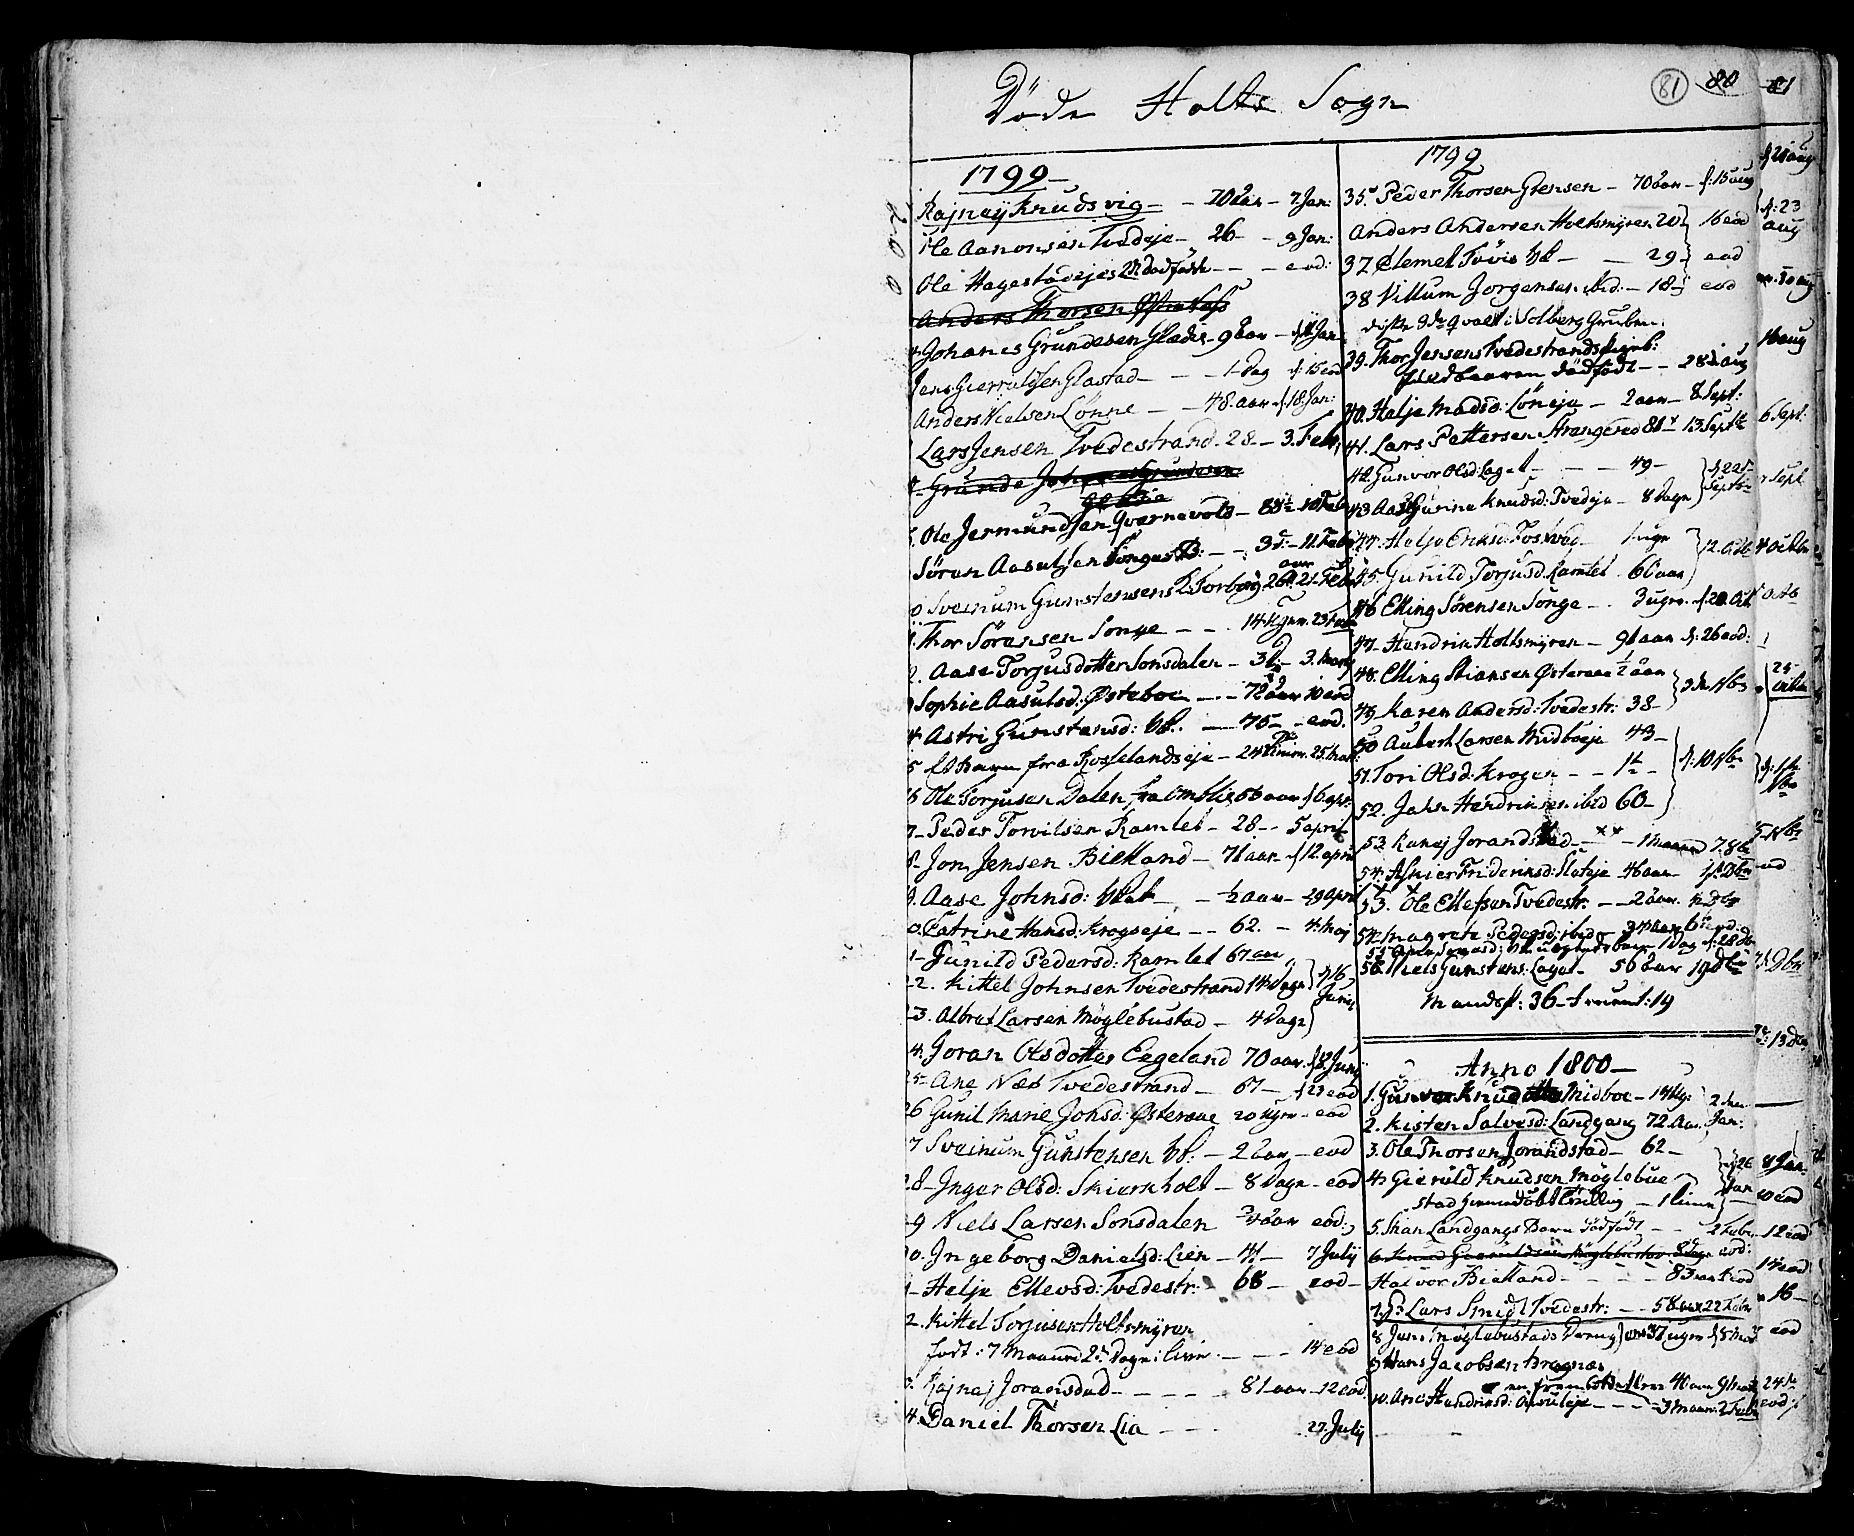 SAK, Holt sokneprestkontor, F/Fa/L0004: Ministerialbok nr. A 4, 1799-1813, s. 81